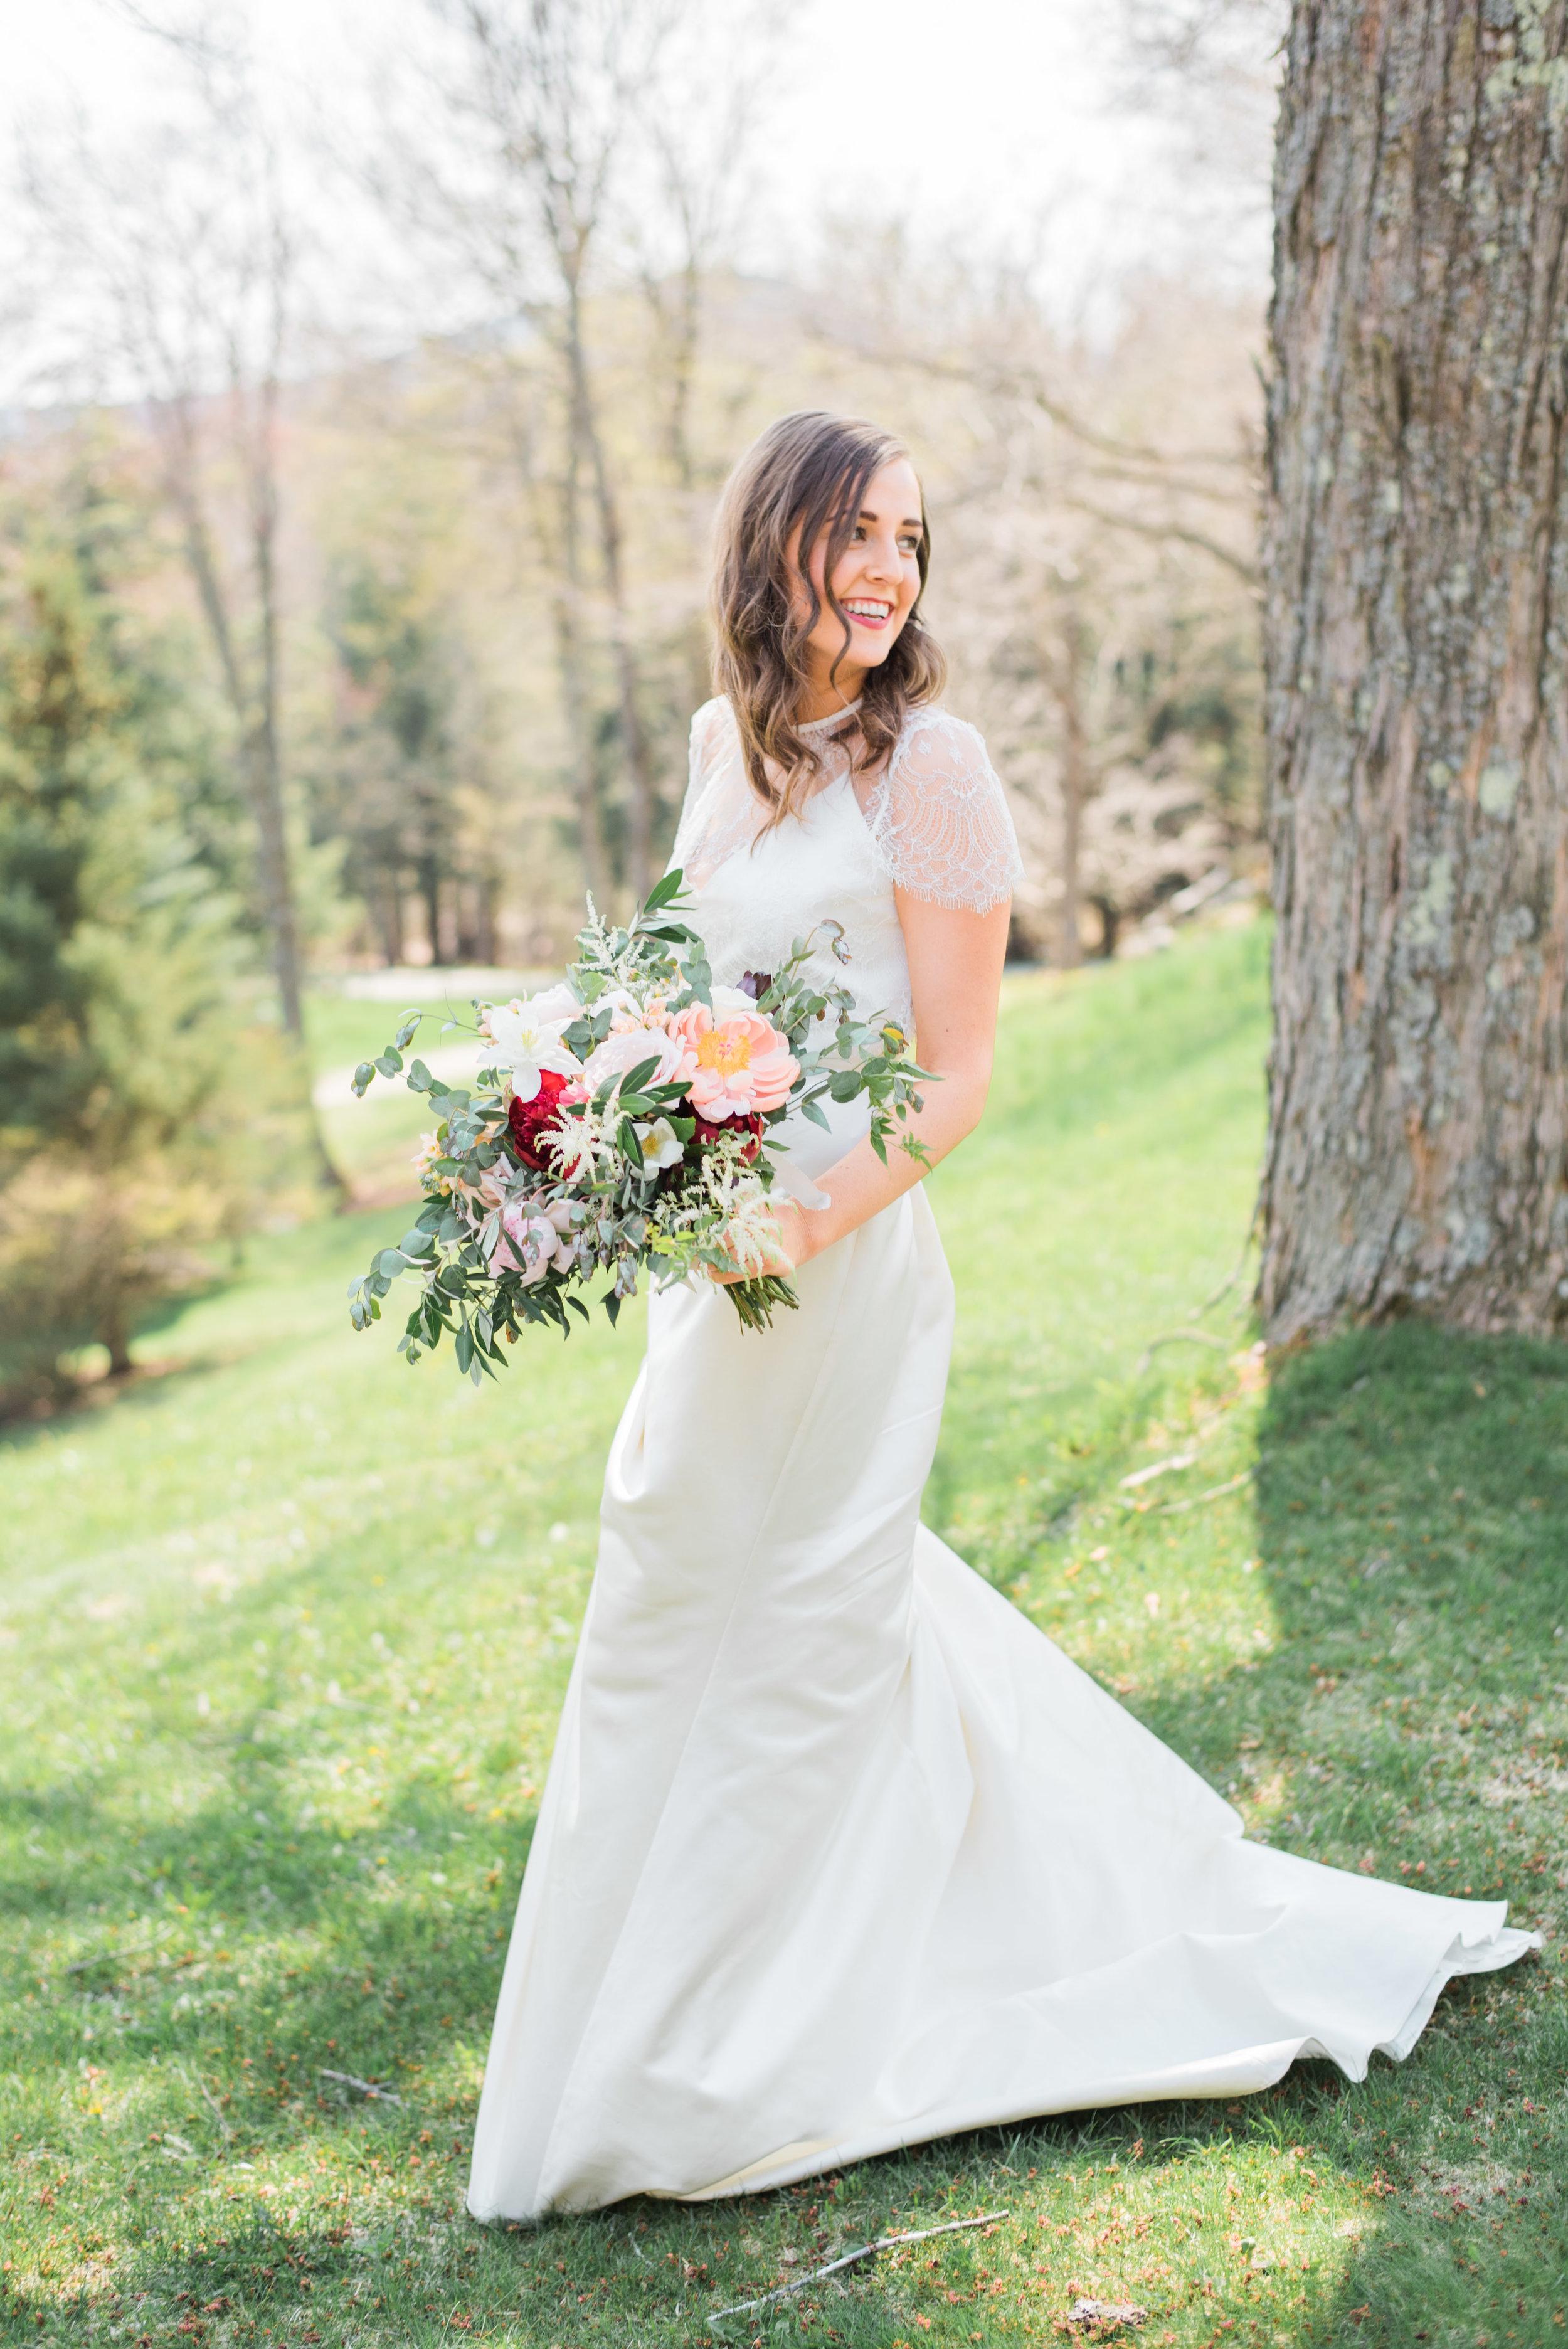 gray-door-photography-wedding-photographer-steph-erffmeyer-dallas-destination-bridal3.jpg